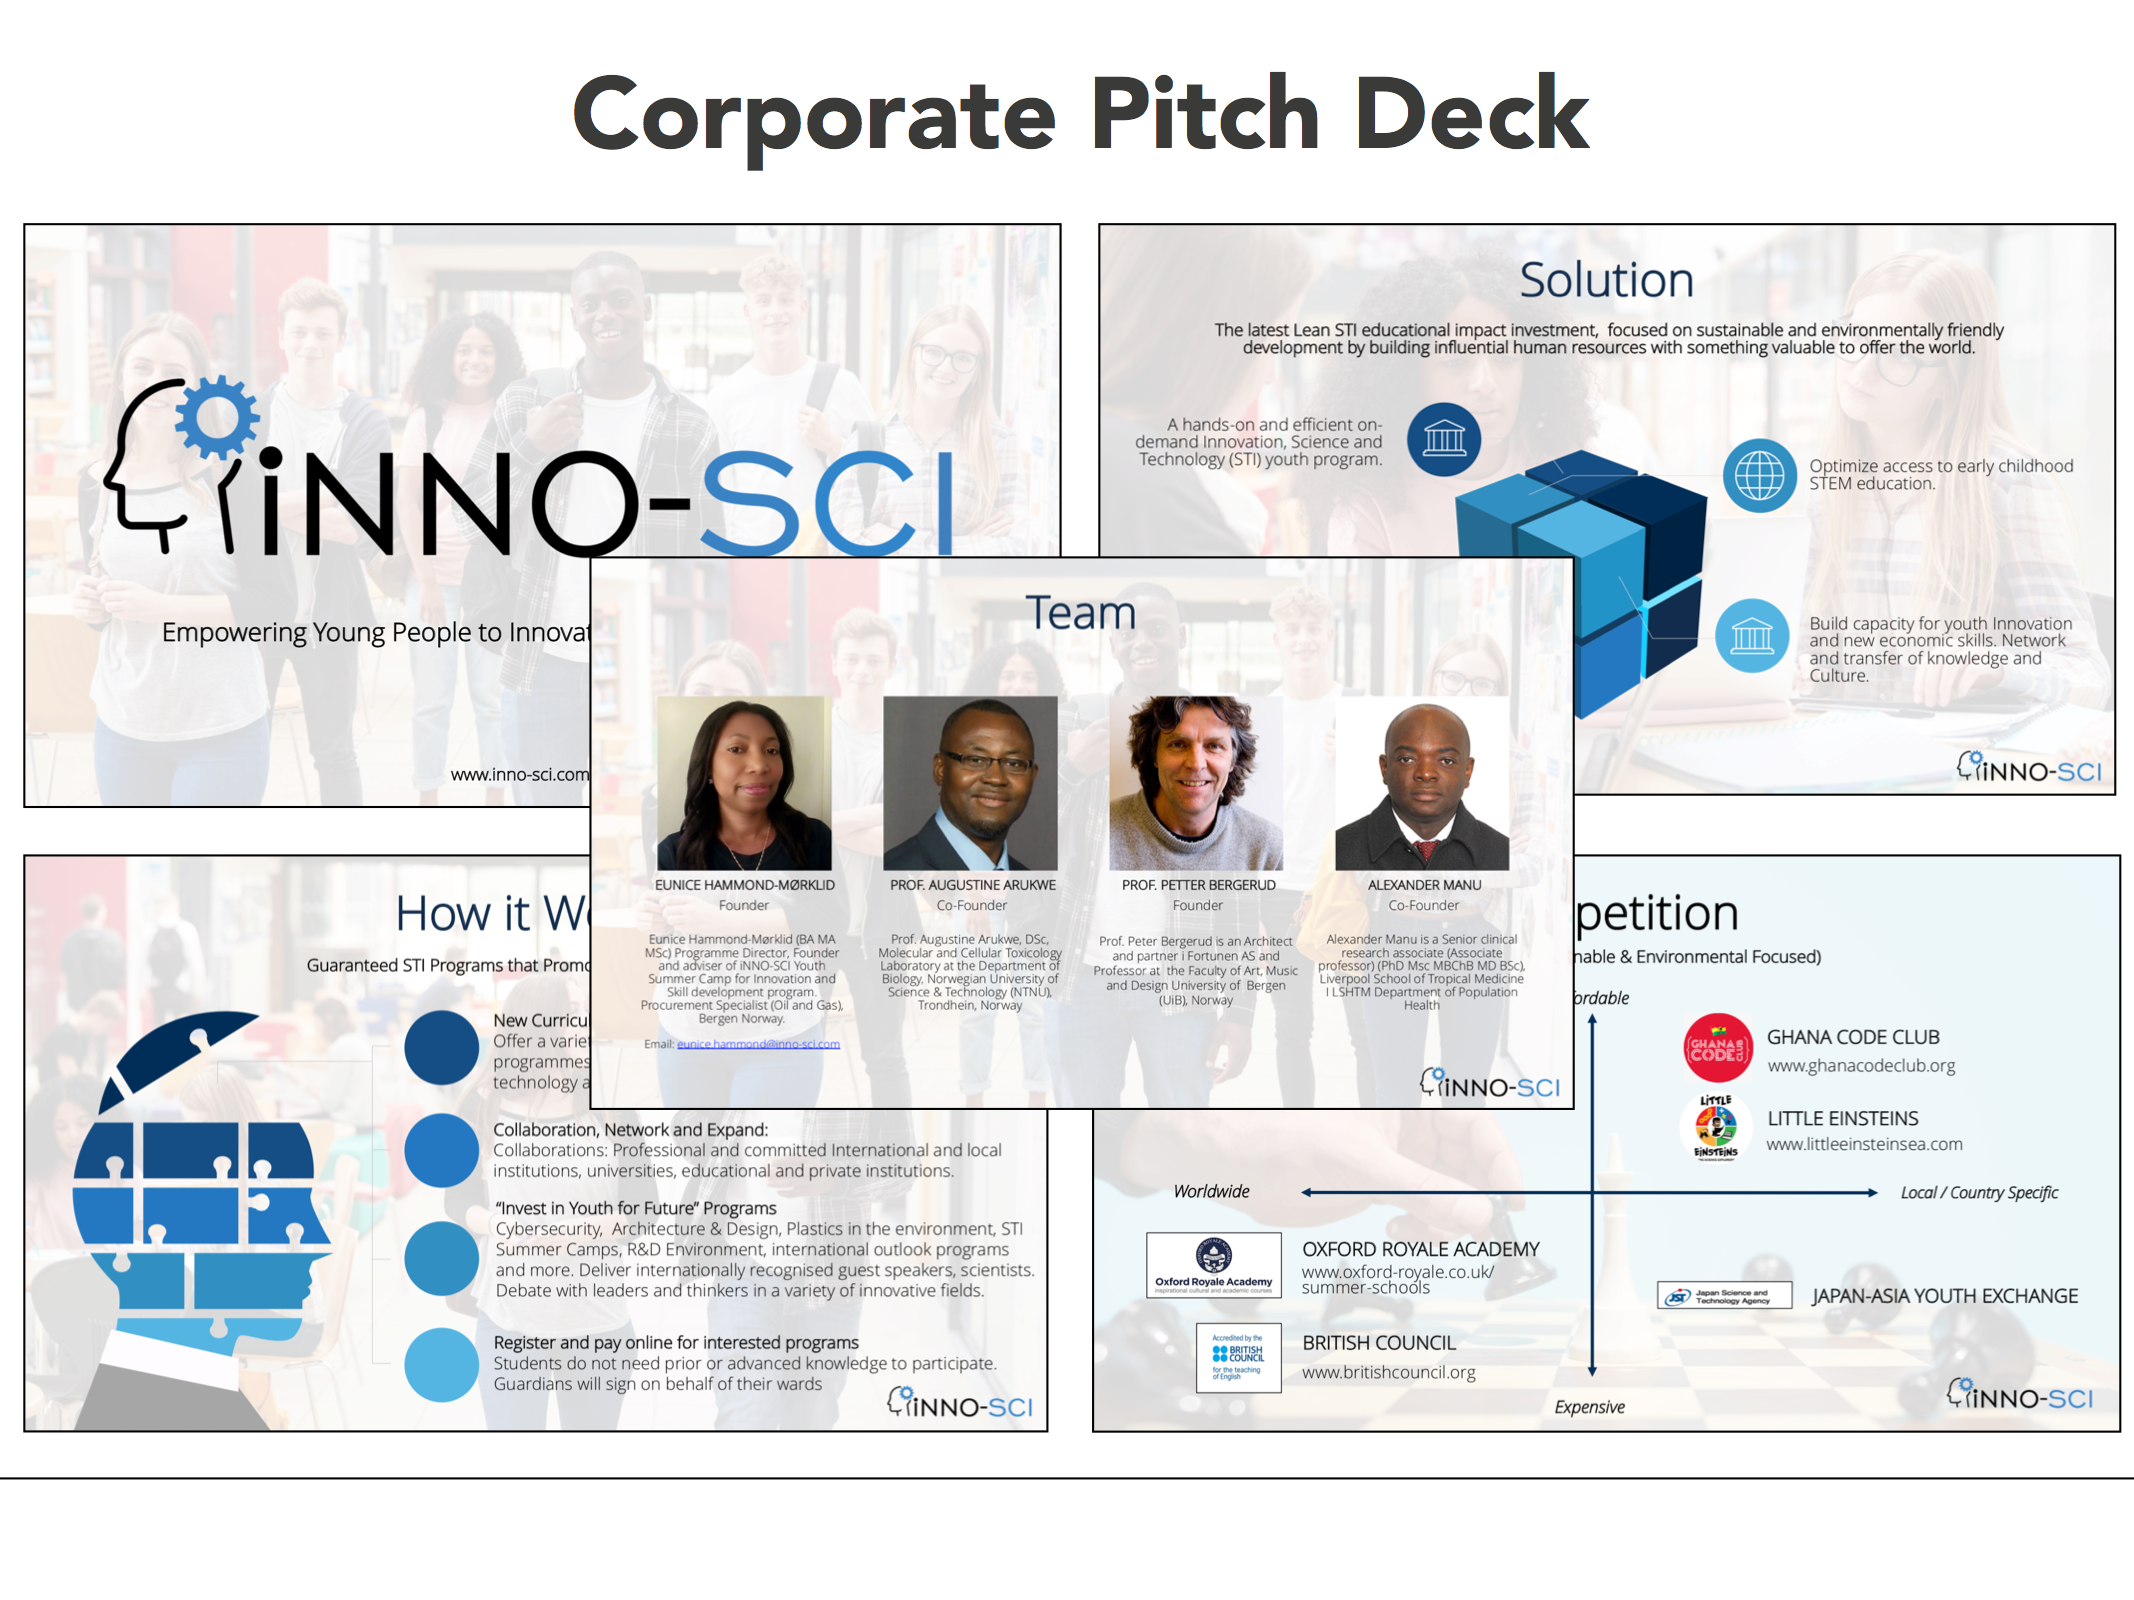 iNNO-Sci Corporate Pitch Deck